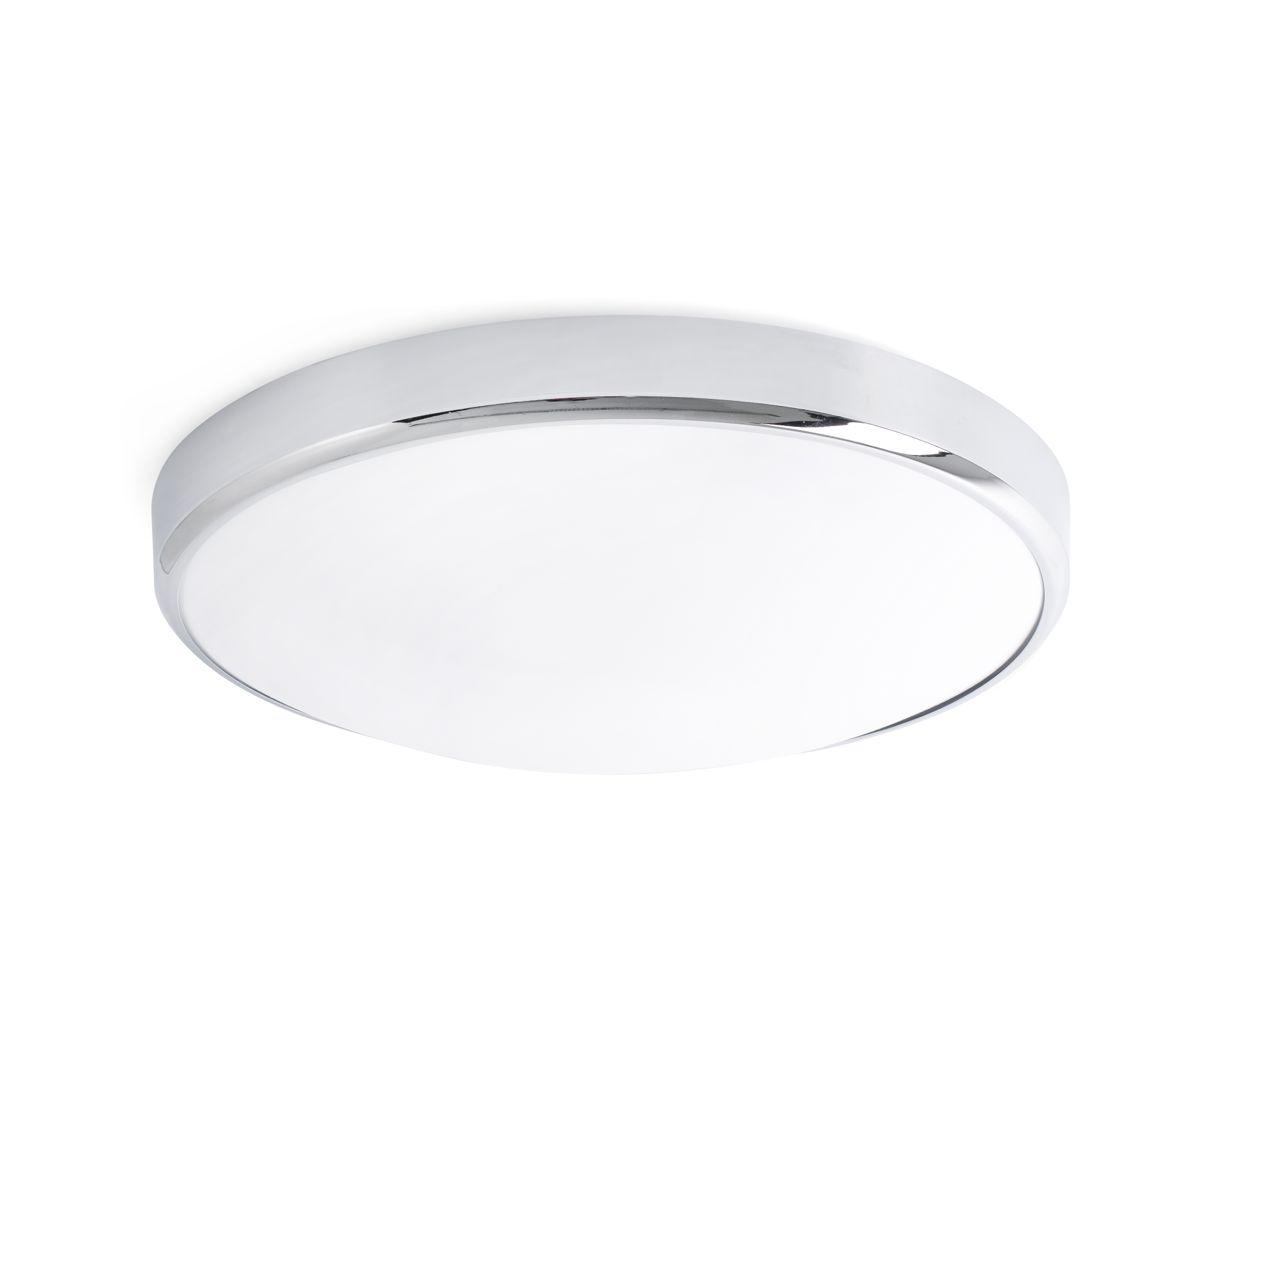 Lamparas Para Baño De Techo: de techo para baños con led lámpara para techo de baños con led de